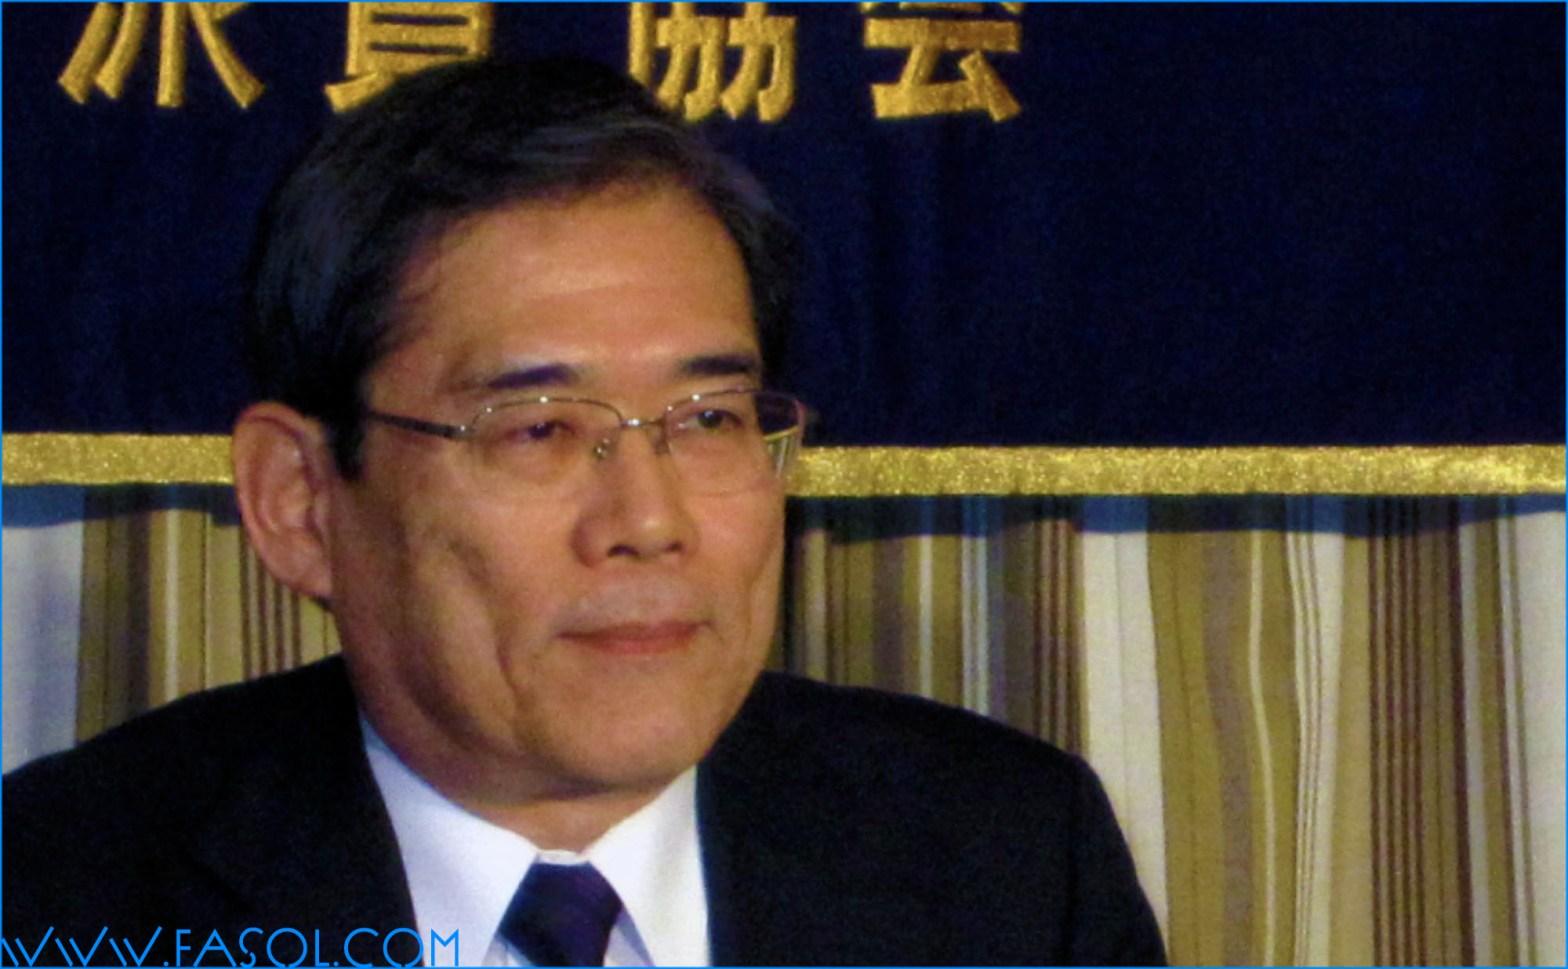 Professor Junichi Hamada, President of Tokyo University